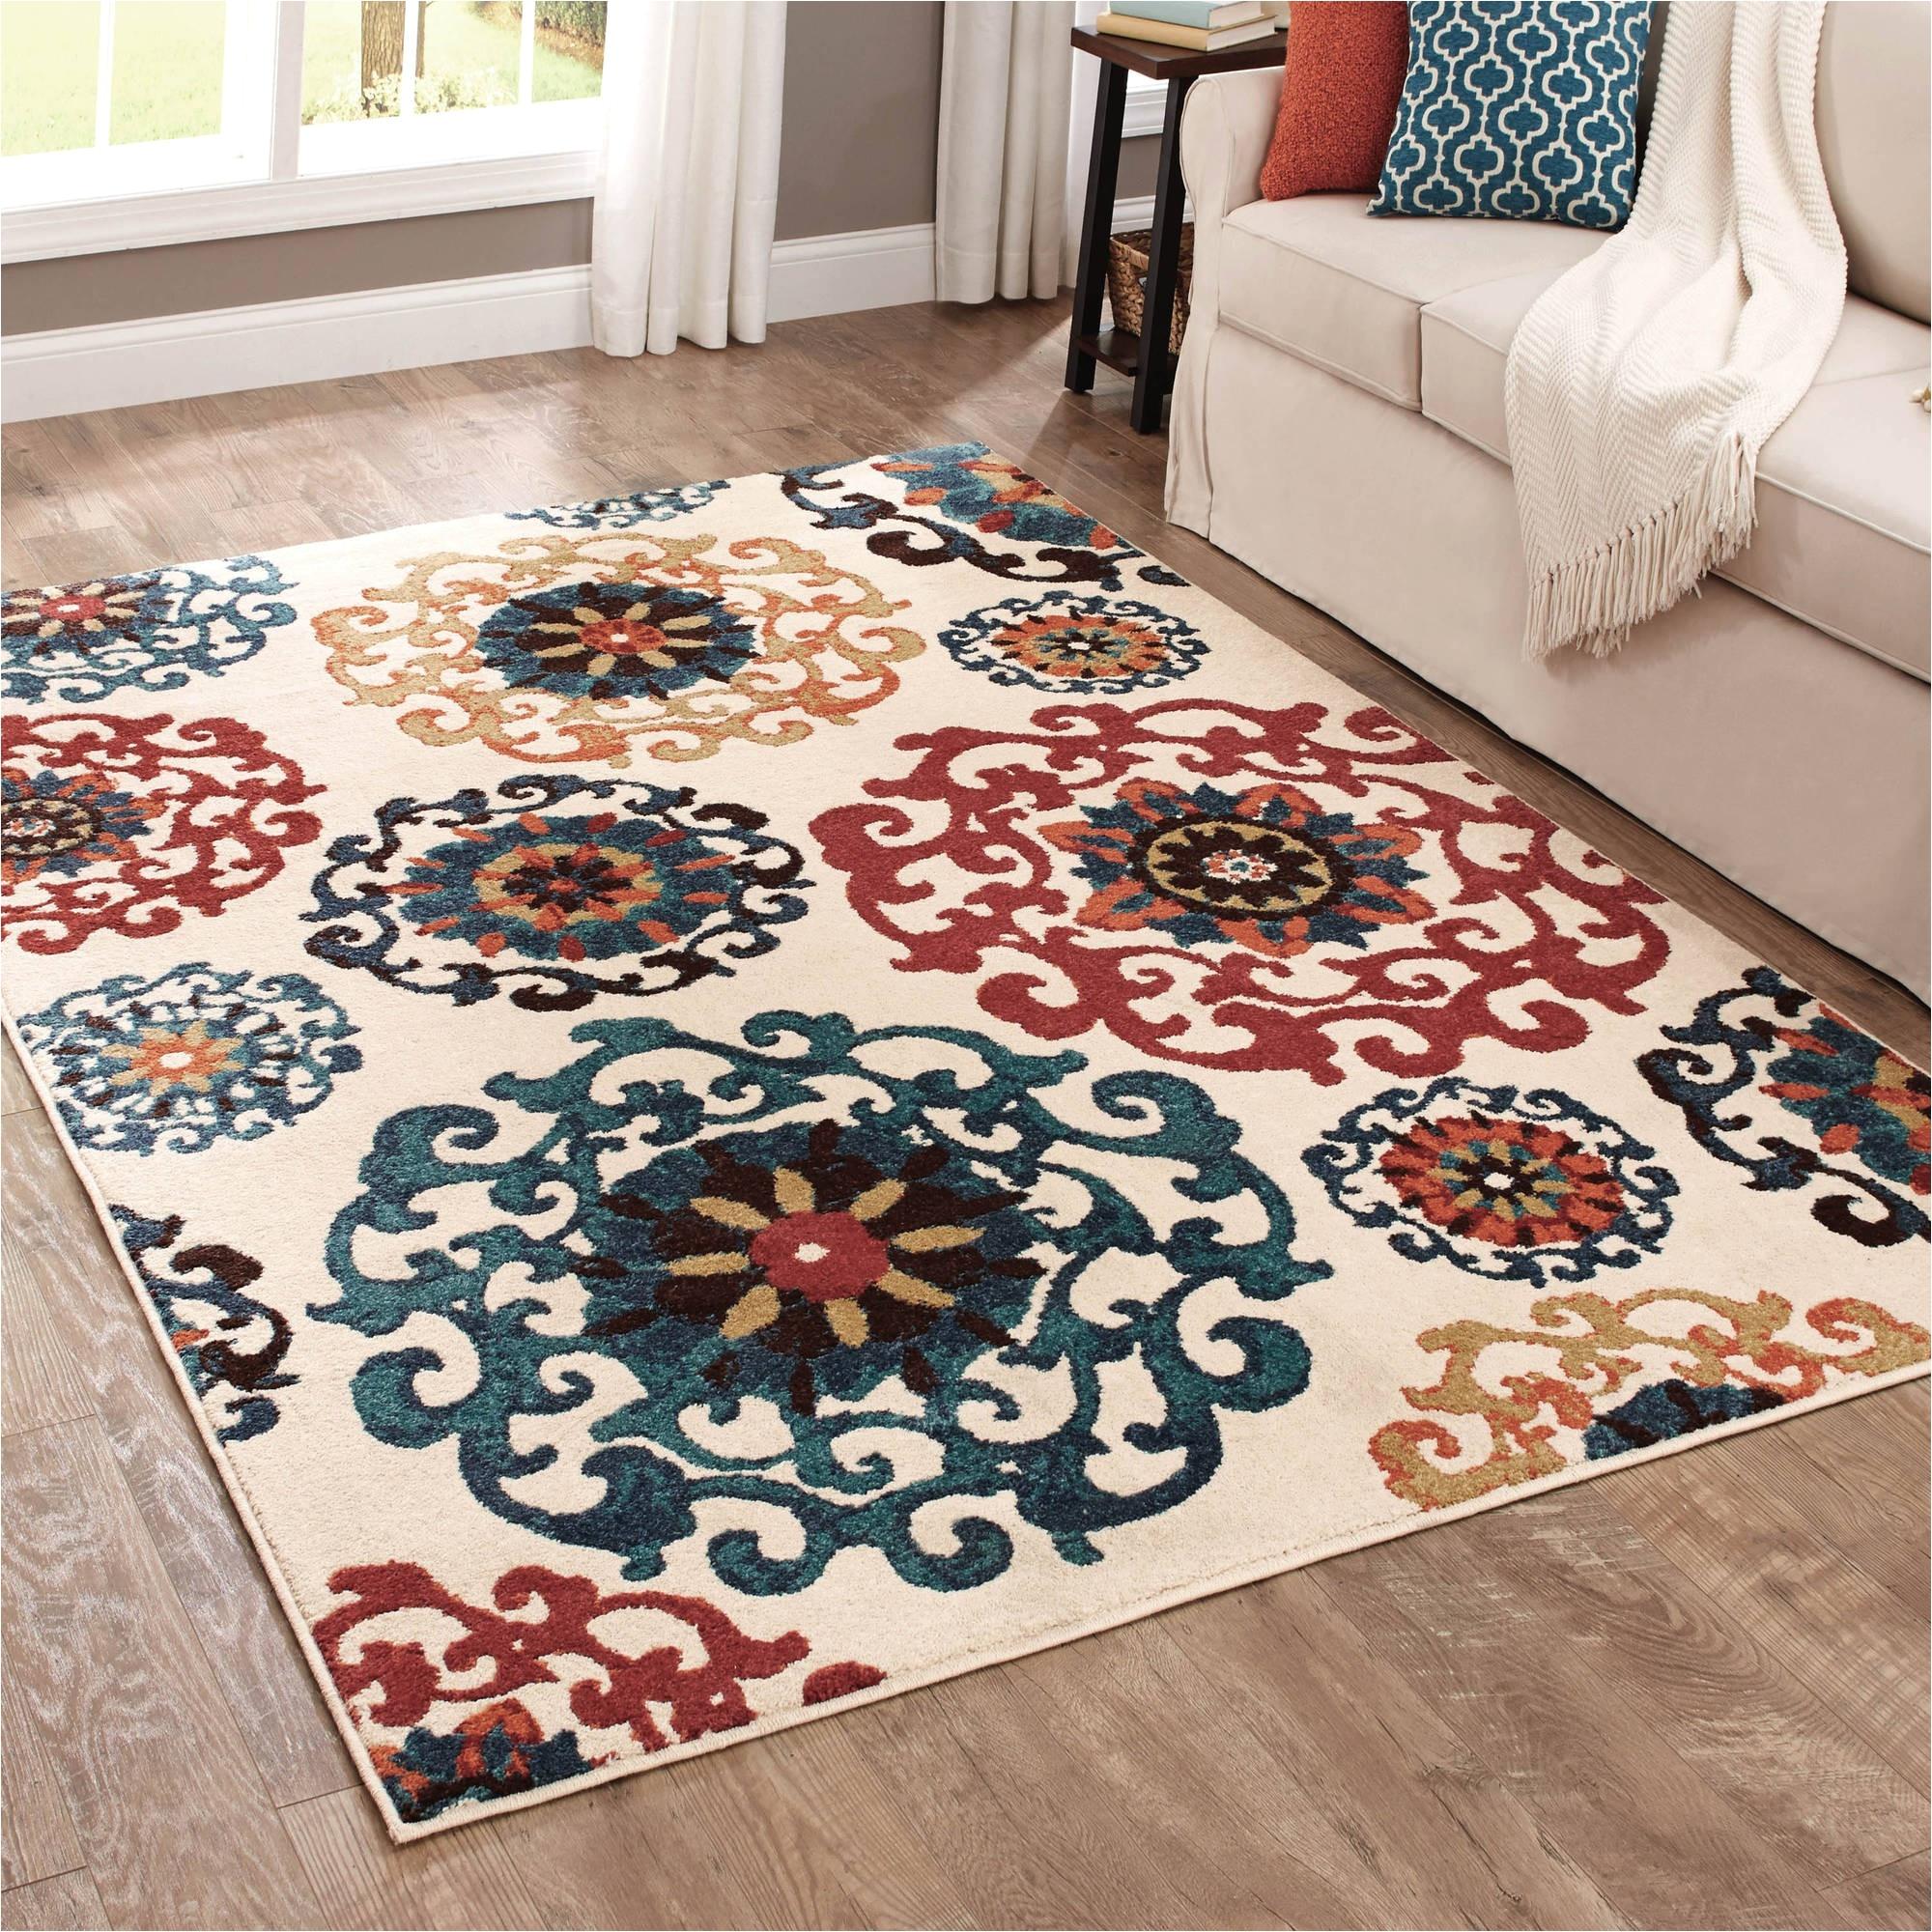 multi colored outdoor rugs elegant inspirational outdoor rugs walmart outdoor of 36 new multi colored outdoor